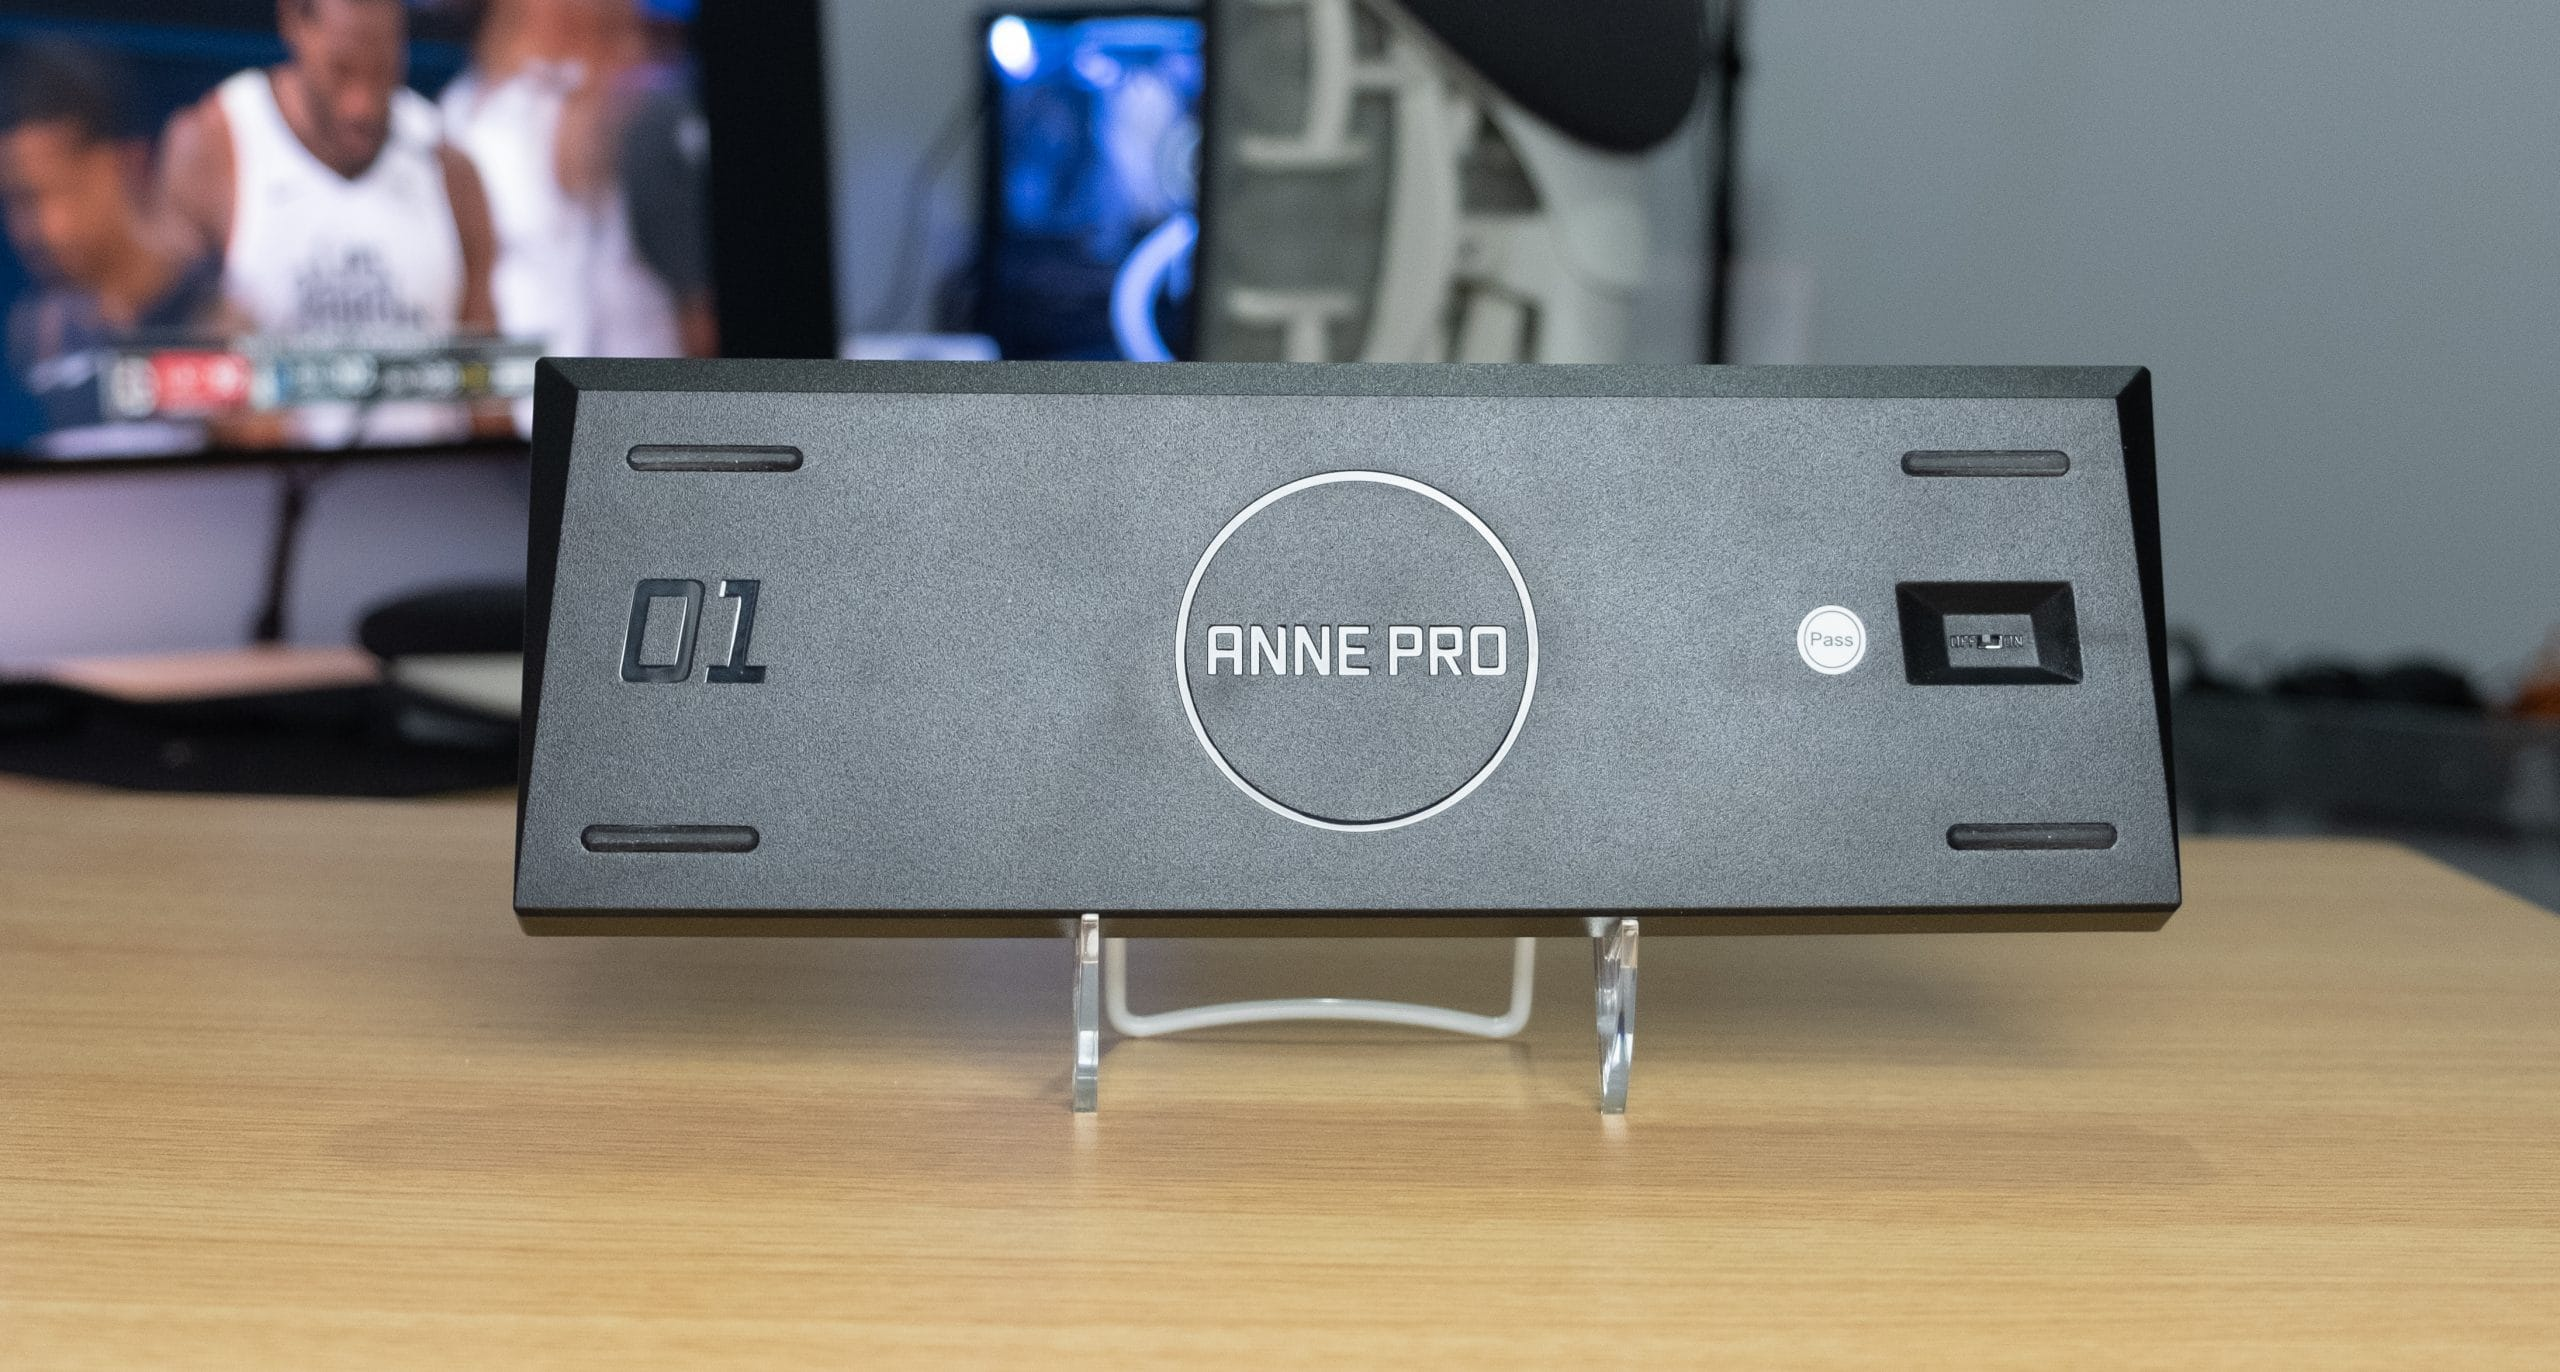 Anne Pro 2 - Back